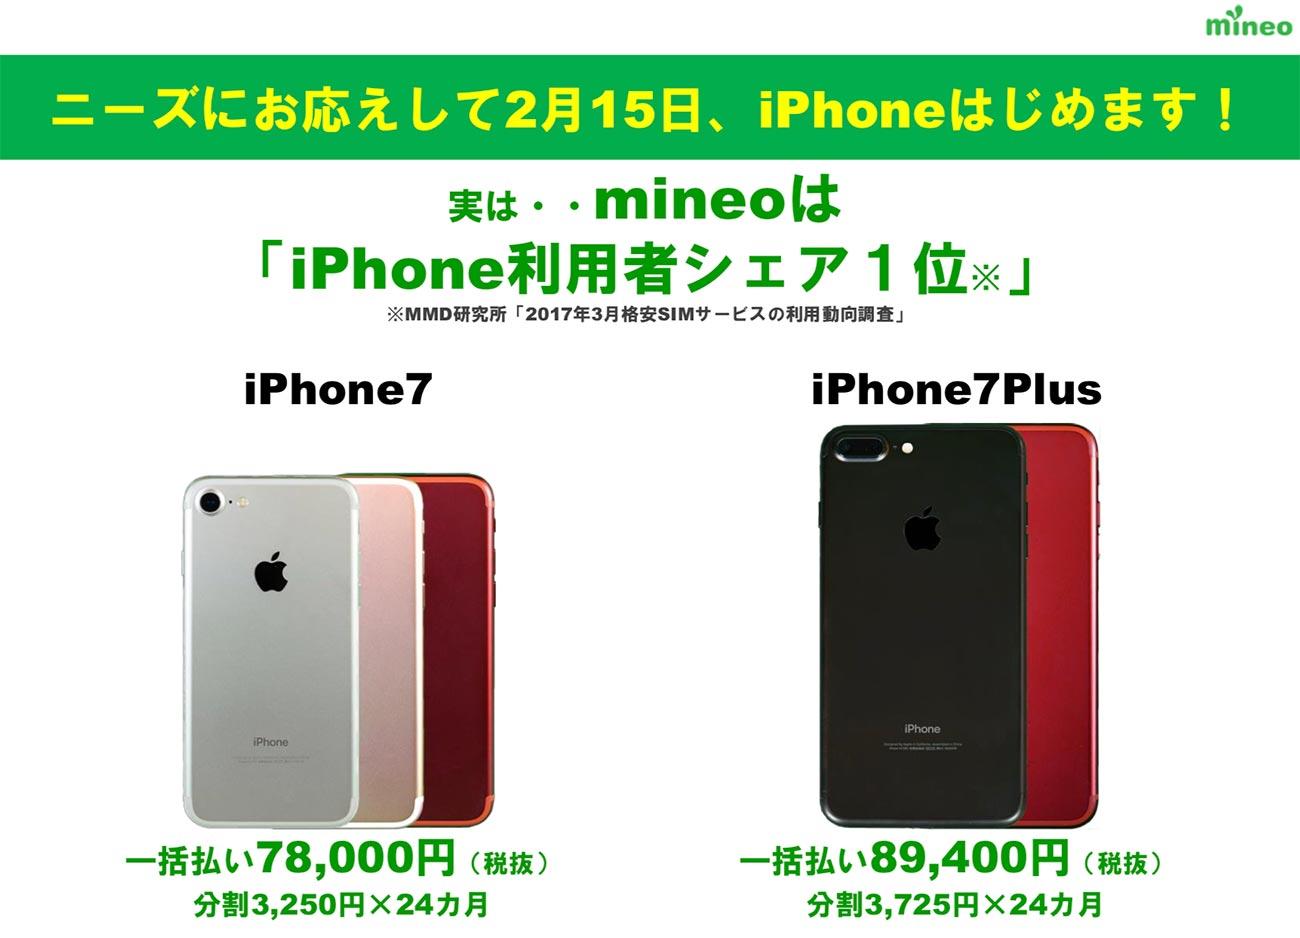 mineo、国内版SIMフリー「iPhone 7」「iPhone 7 Plus」の取り扱いを2月15日開始